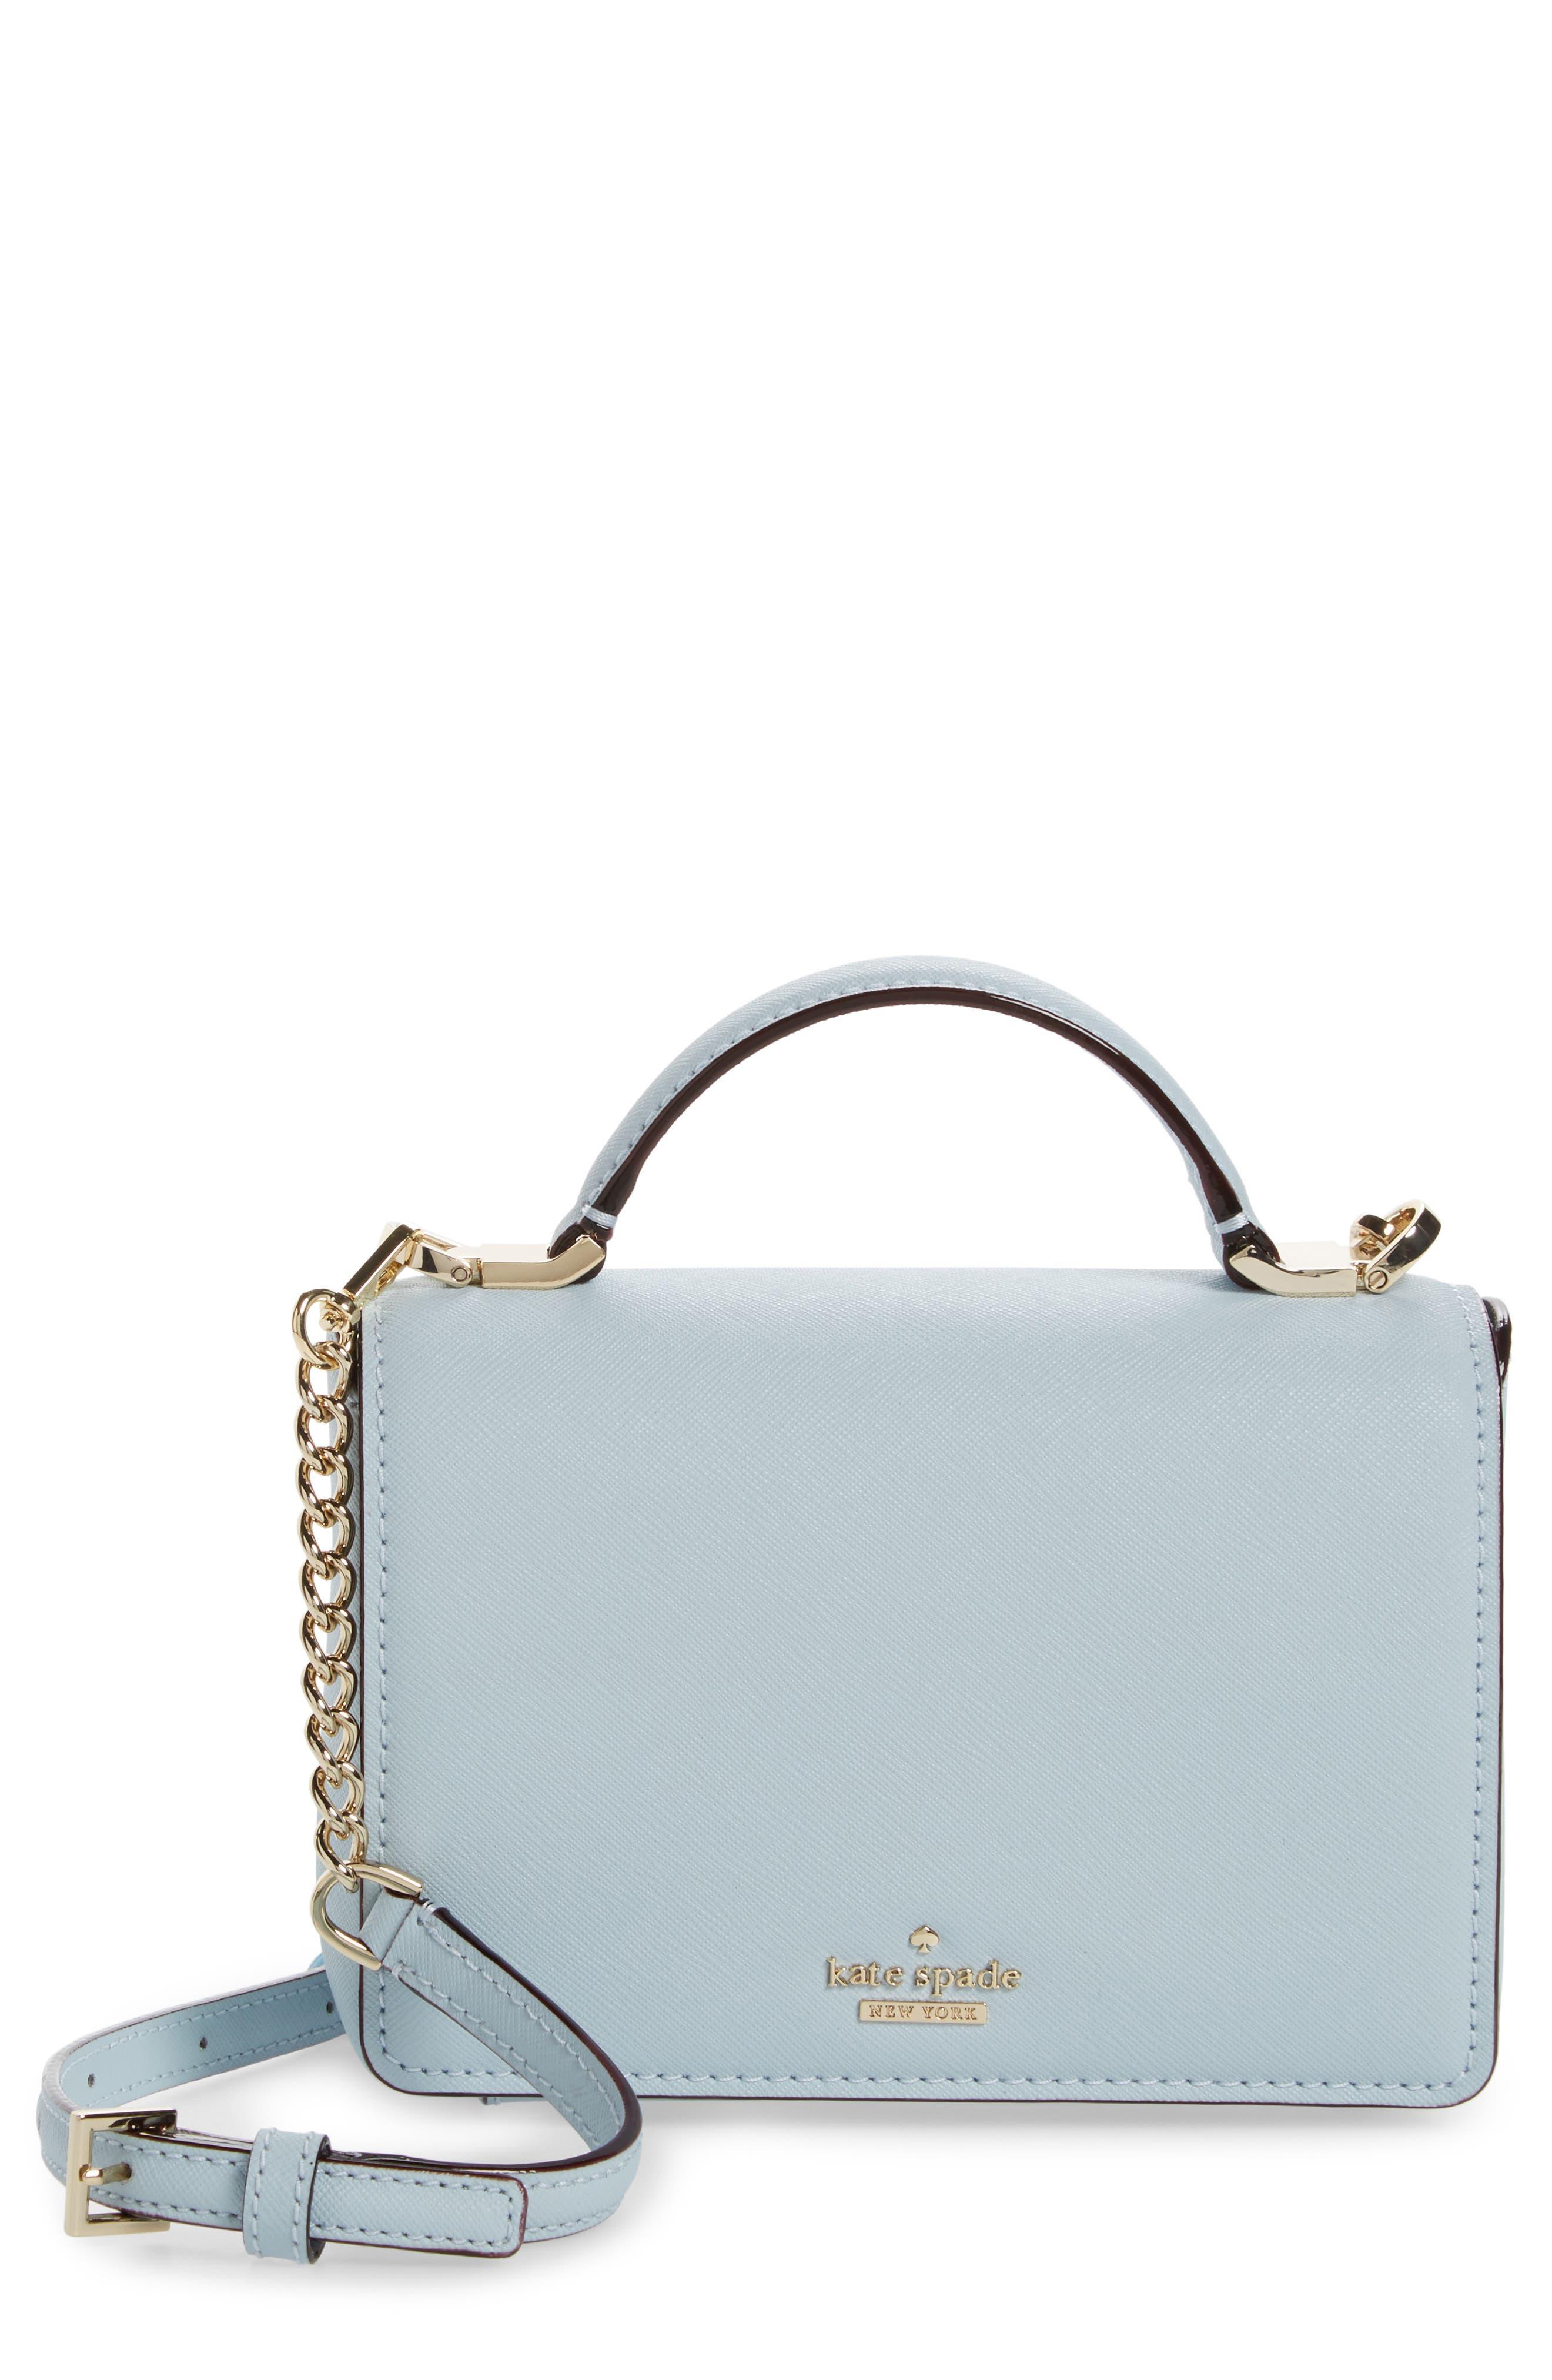 cameron street - hope saffiano leather crossbody bag,                             Main thumbnail 2, color,